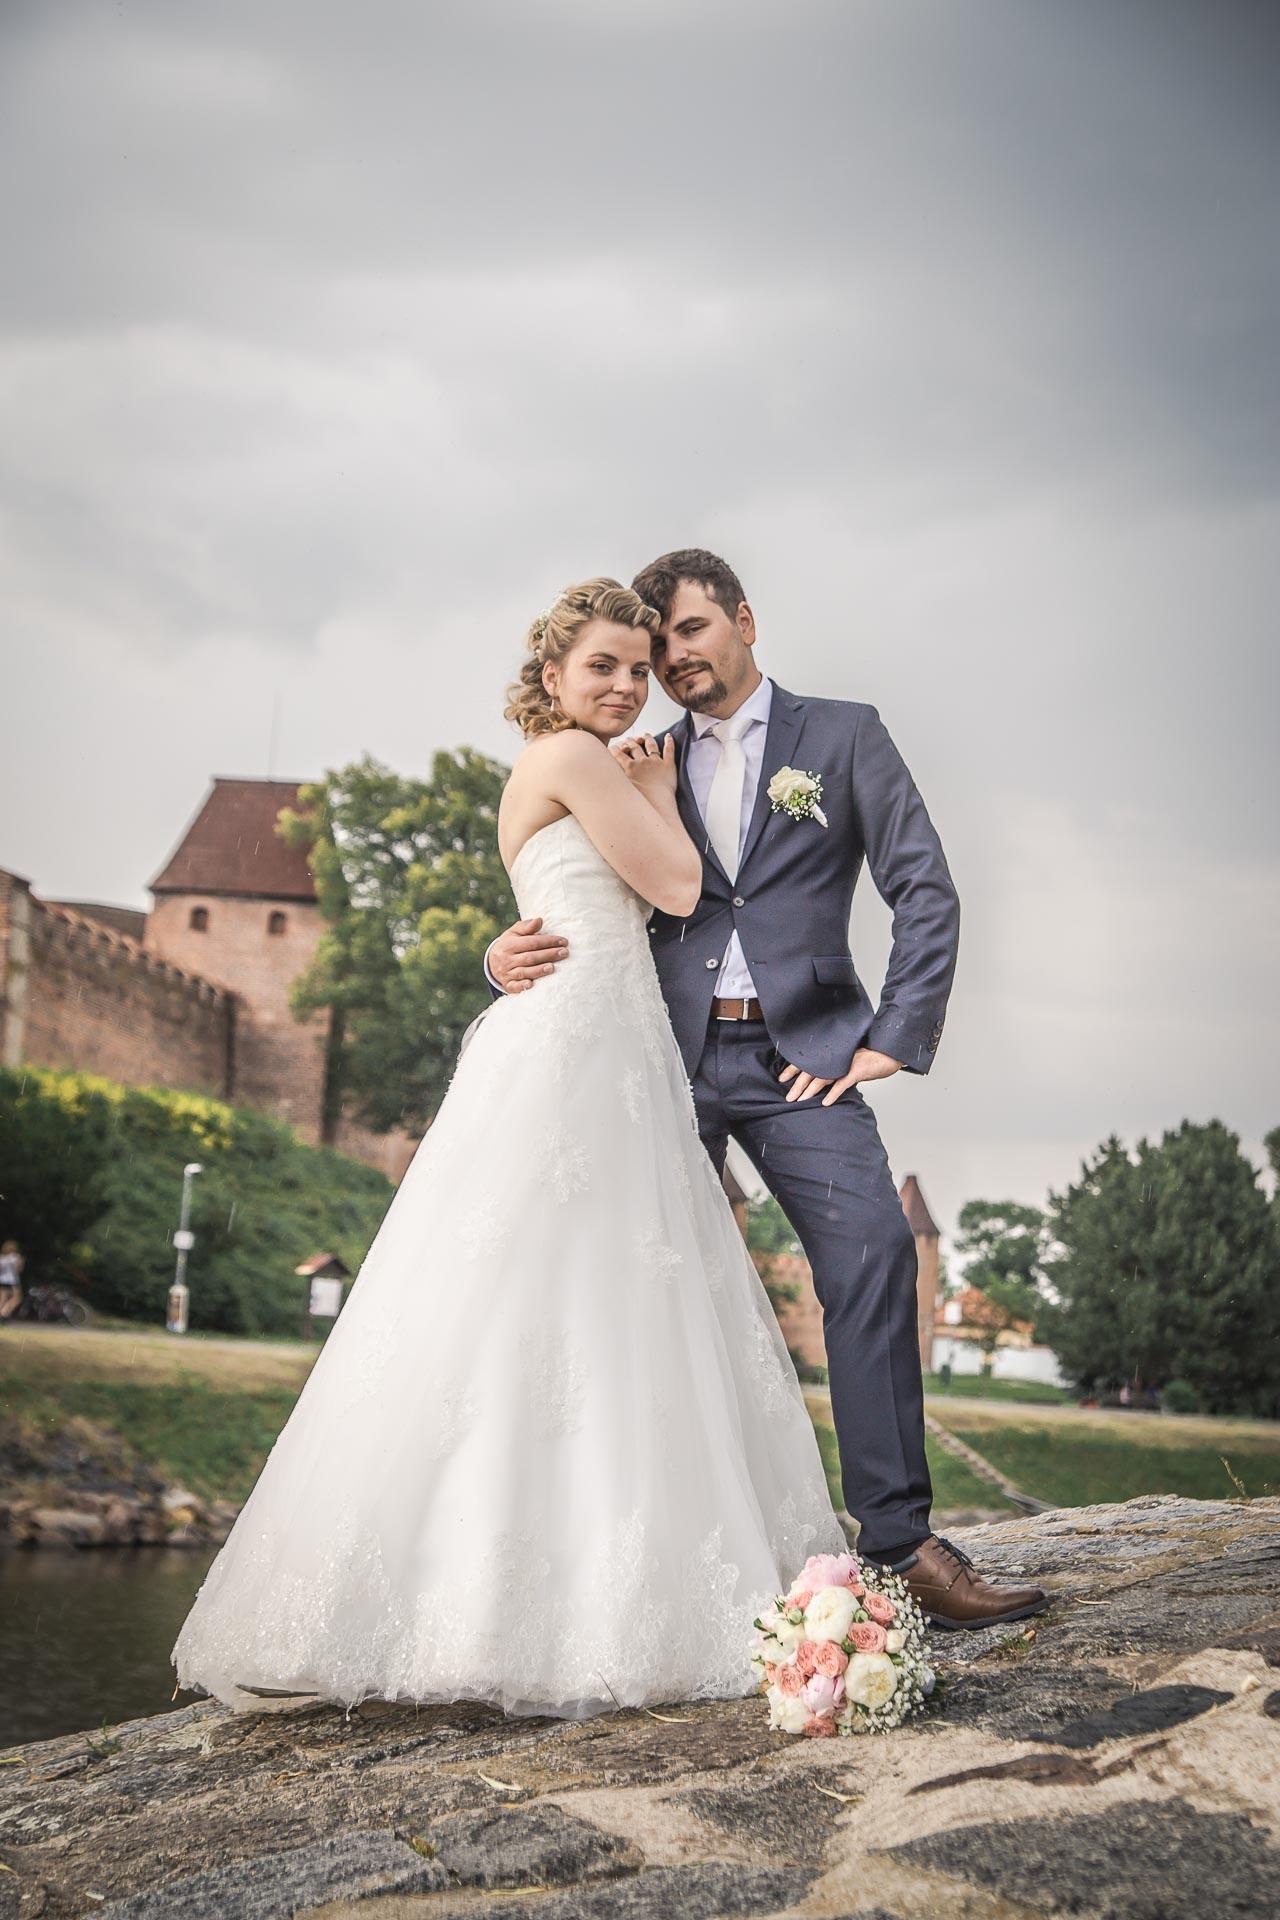 Svatební-fotograf-Nymburk-6215